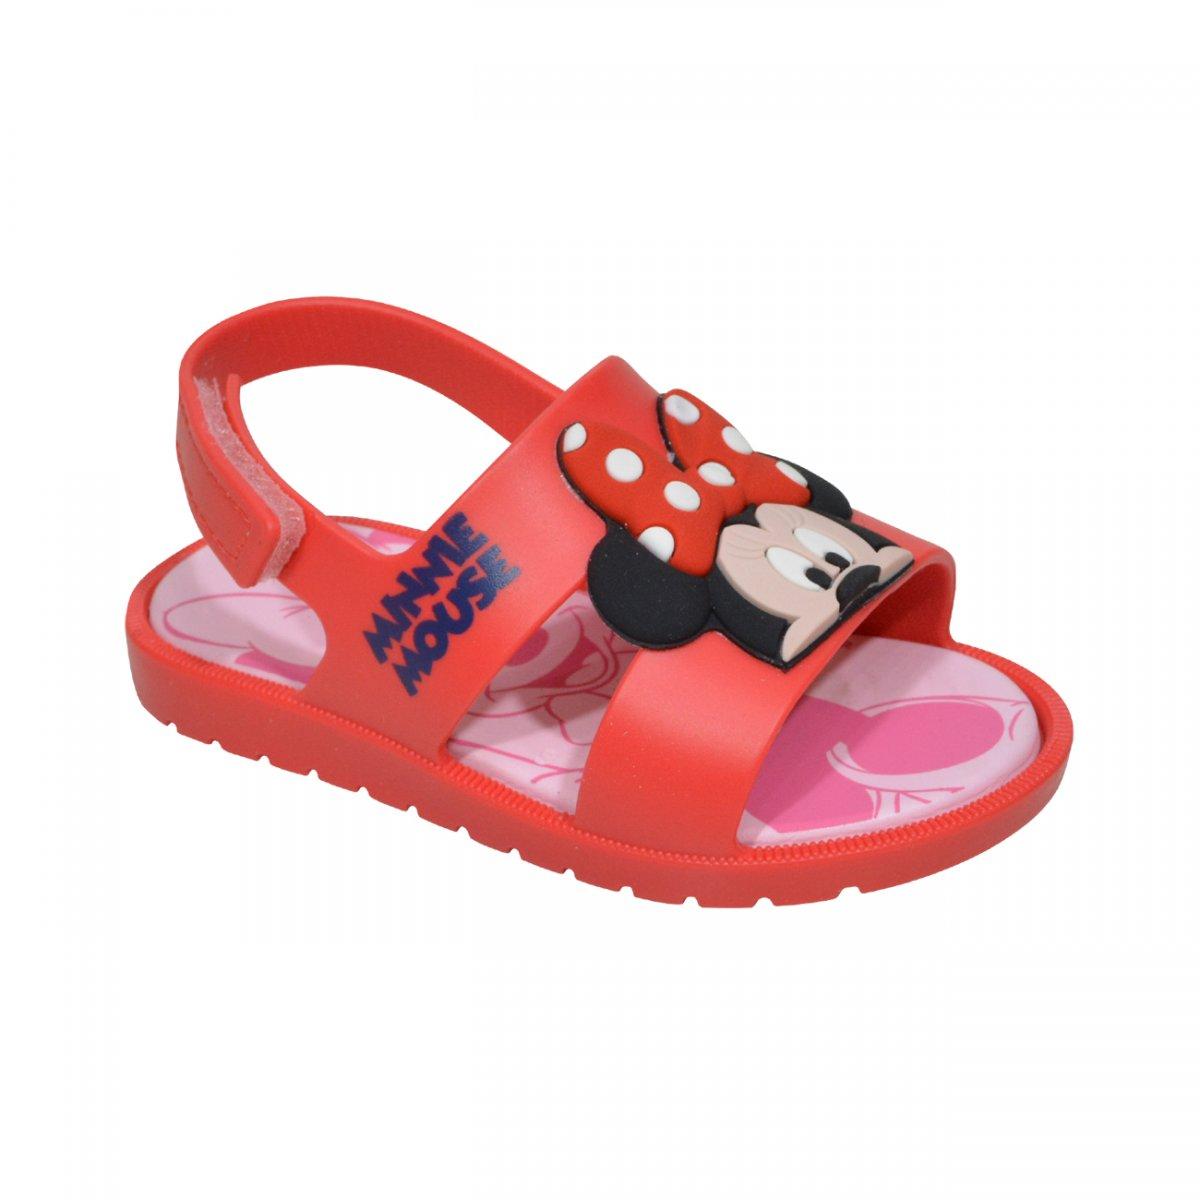 Sustancialmente Chelín Frustración  Sandalia Grendene Disney Mickey e Minnie 21996 Bebe 21996 24007 ...